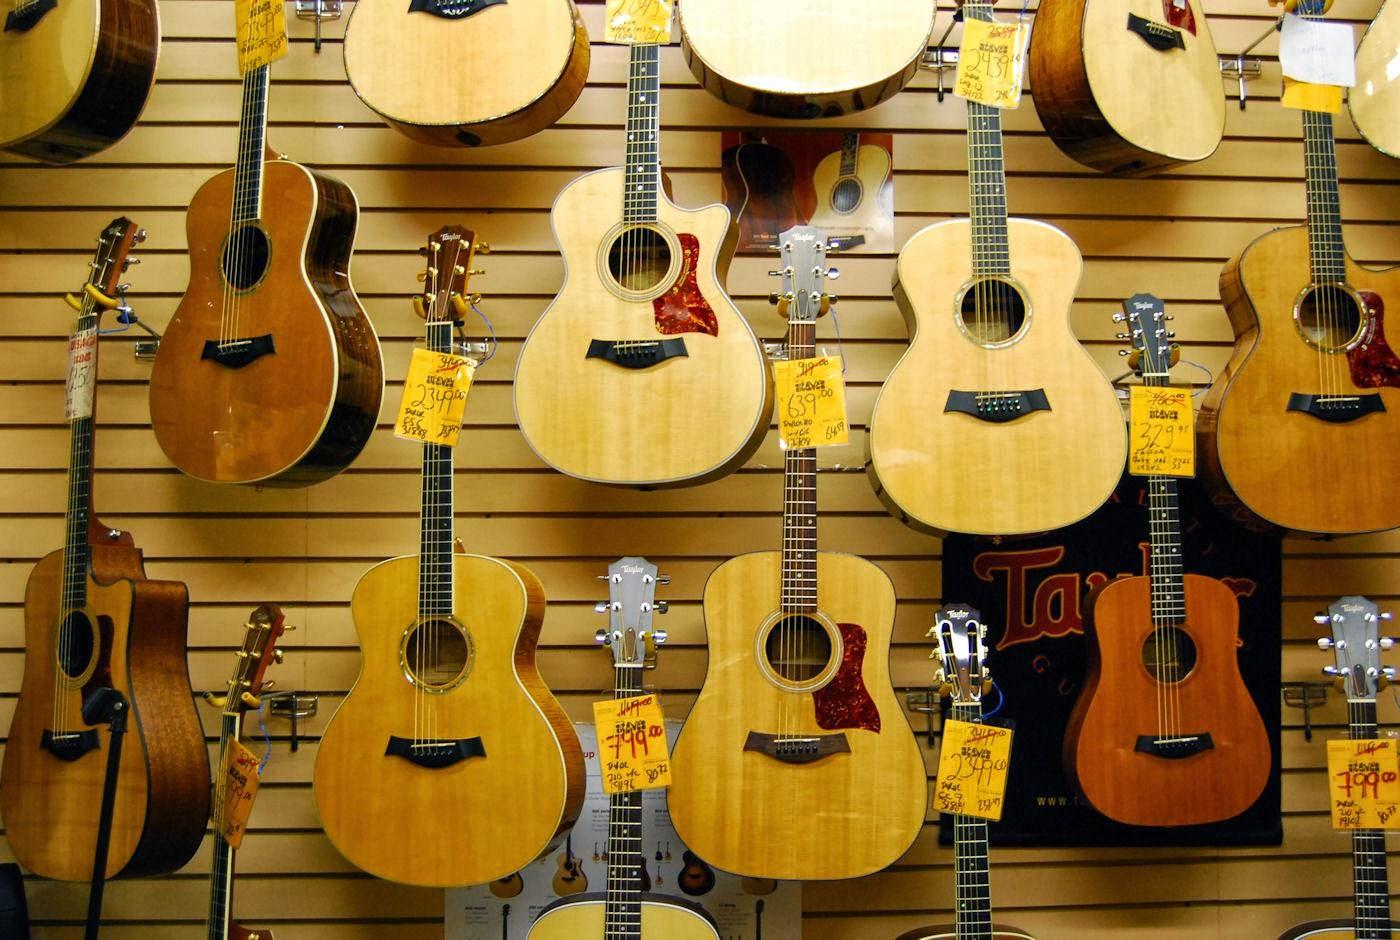 Wallpaper HD: Musical Instruments Wallpapers